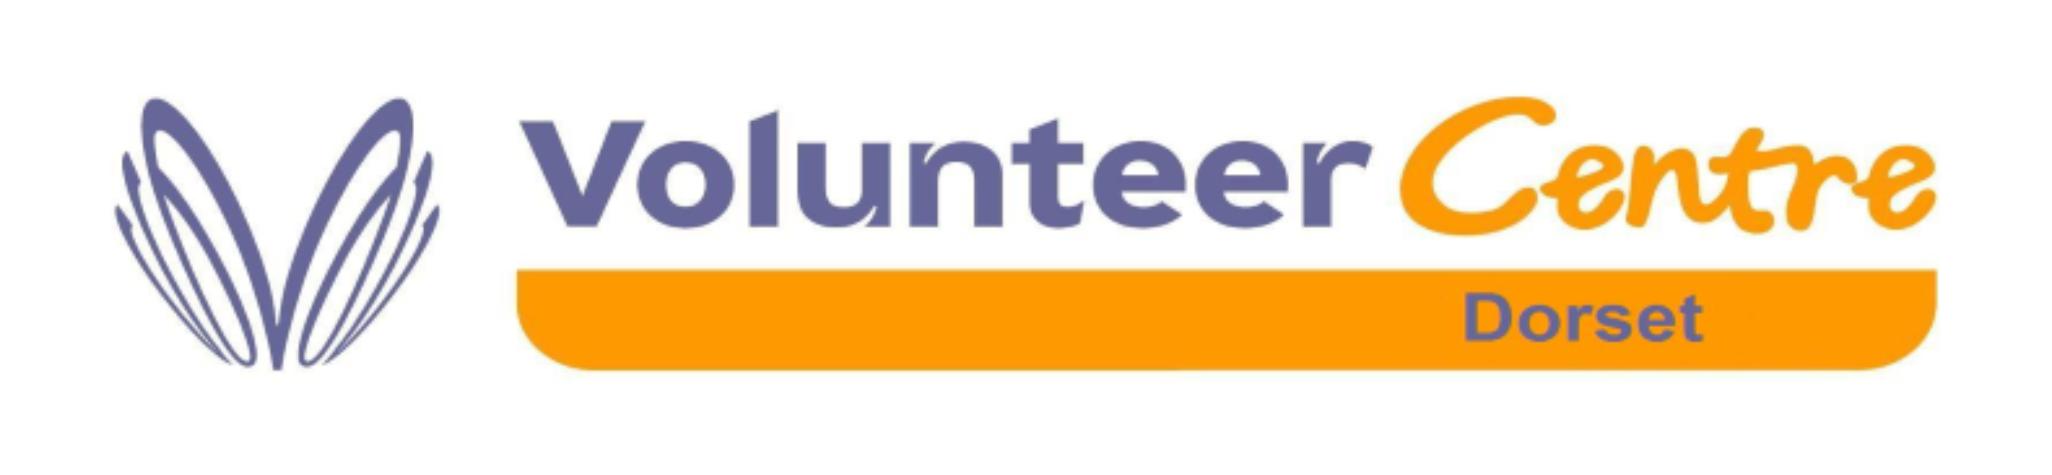 Sturminster Newton-Volunteer Centre Dorset 3